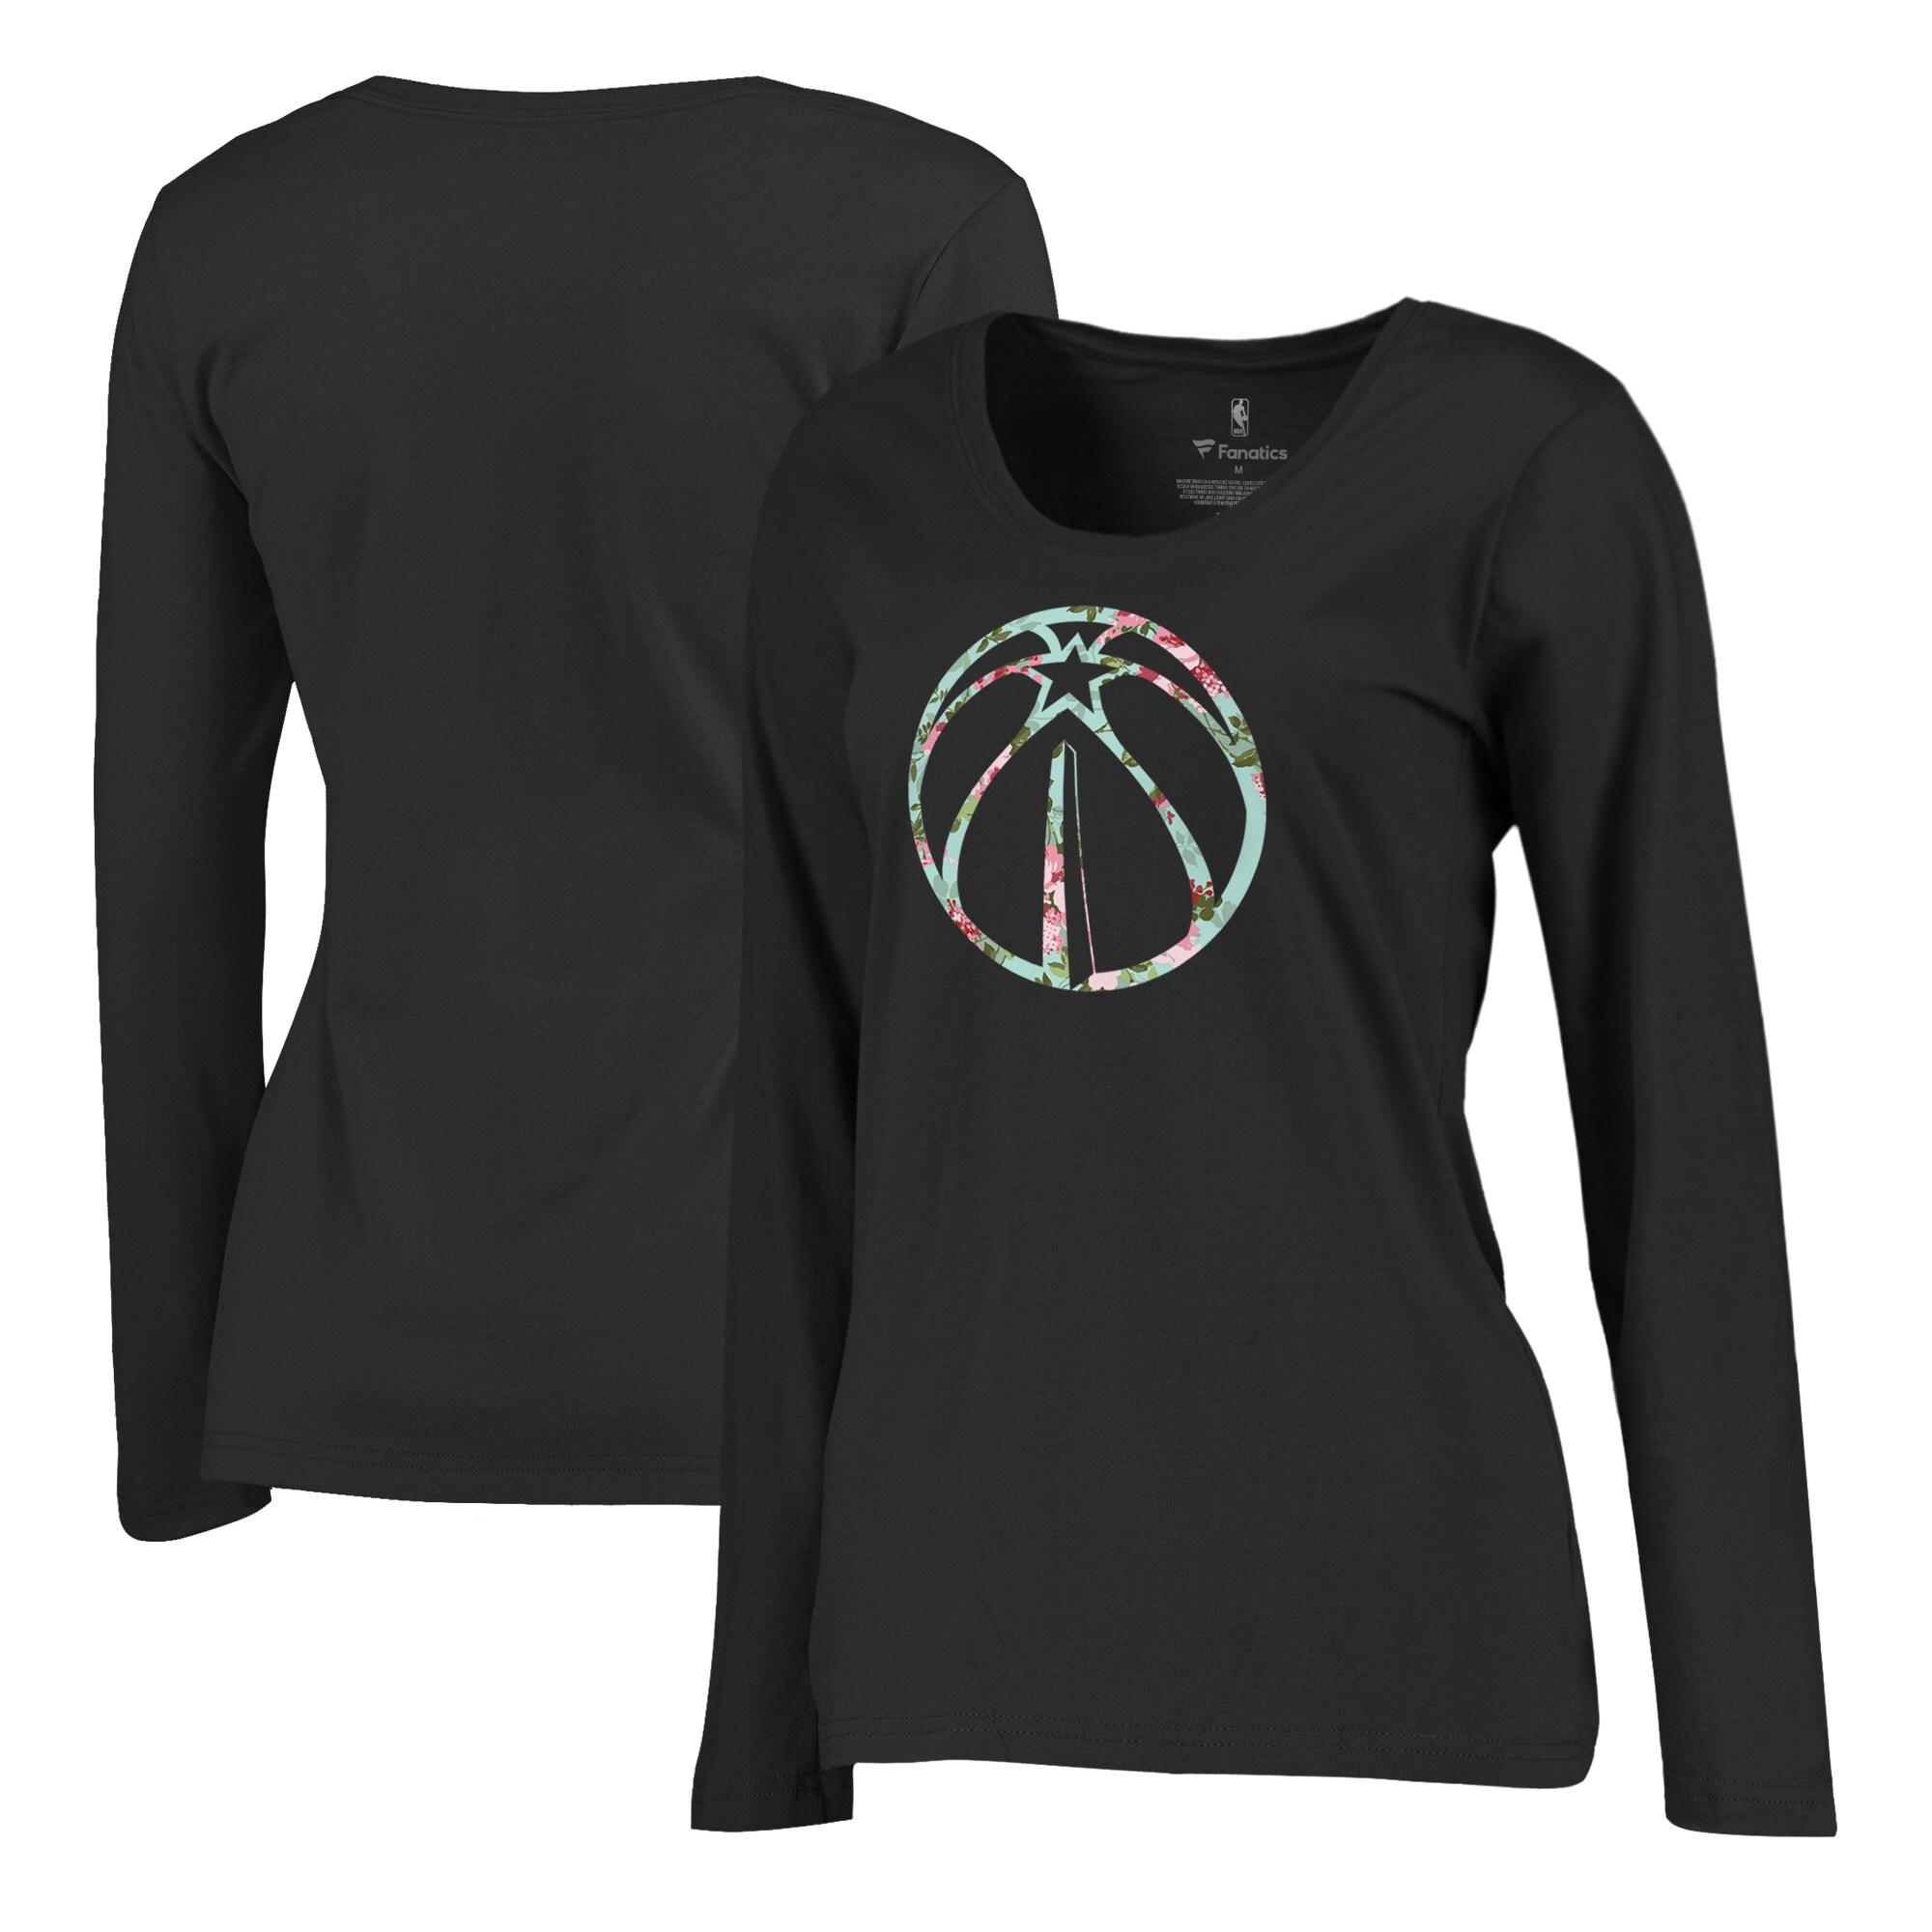 Washington Wizards Fanatics Branded Women's Lovely Plus Size Long Sleeve T-Shirt - Black